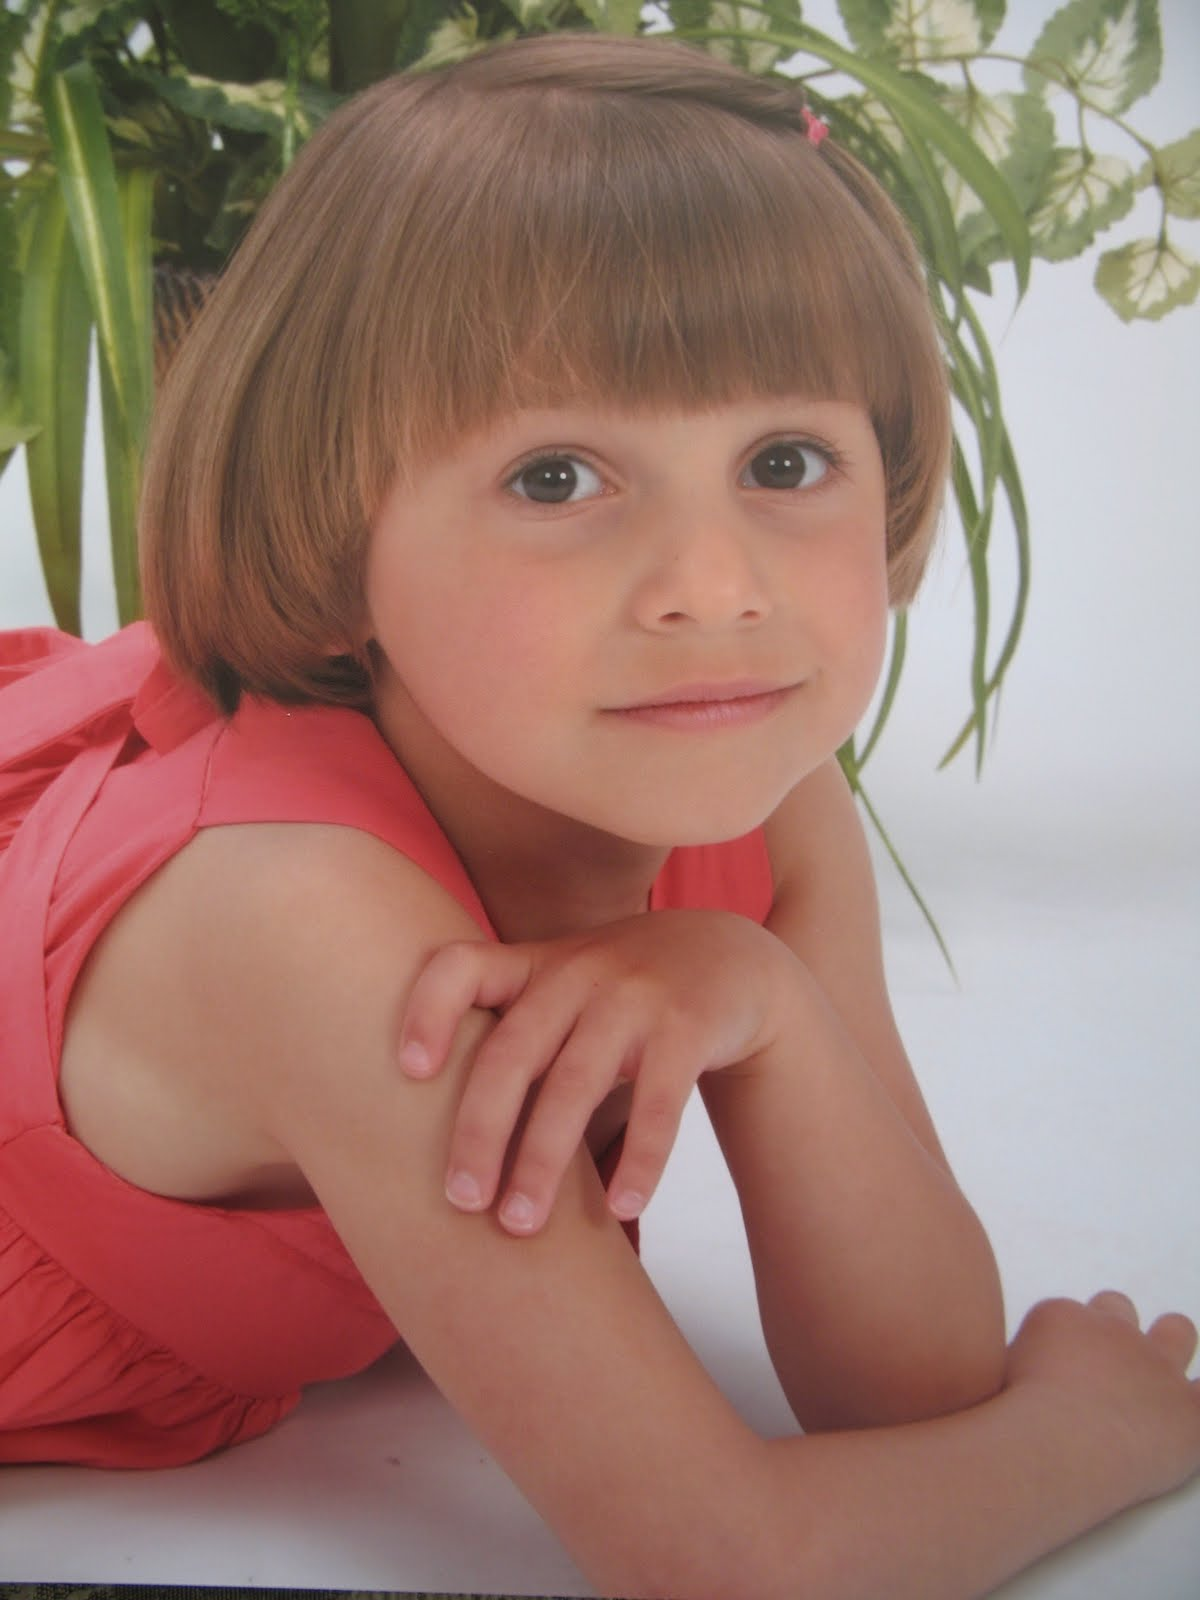 ukrainian-angels 81 | Image - 8 (max 2000)